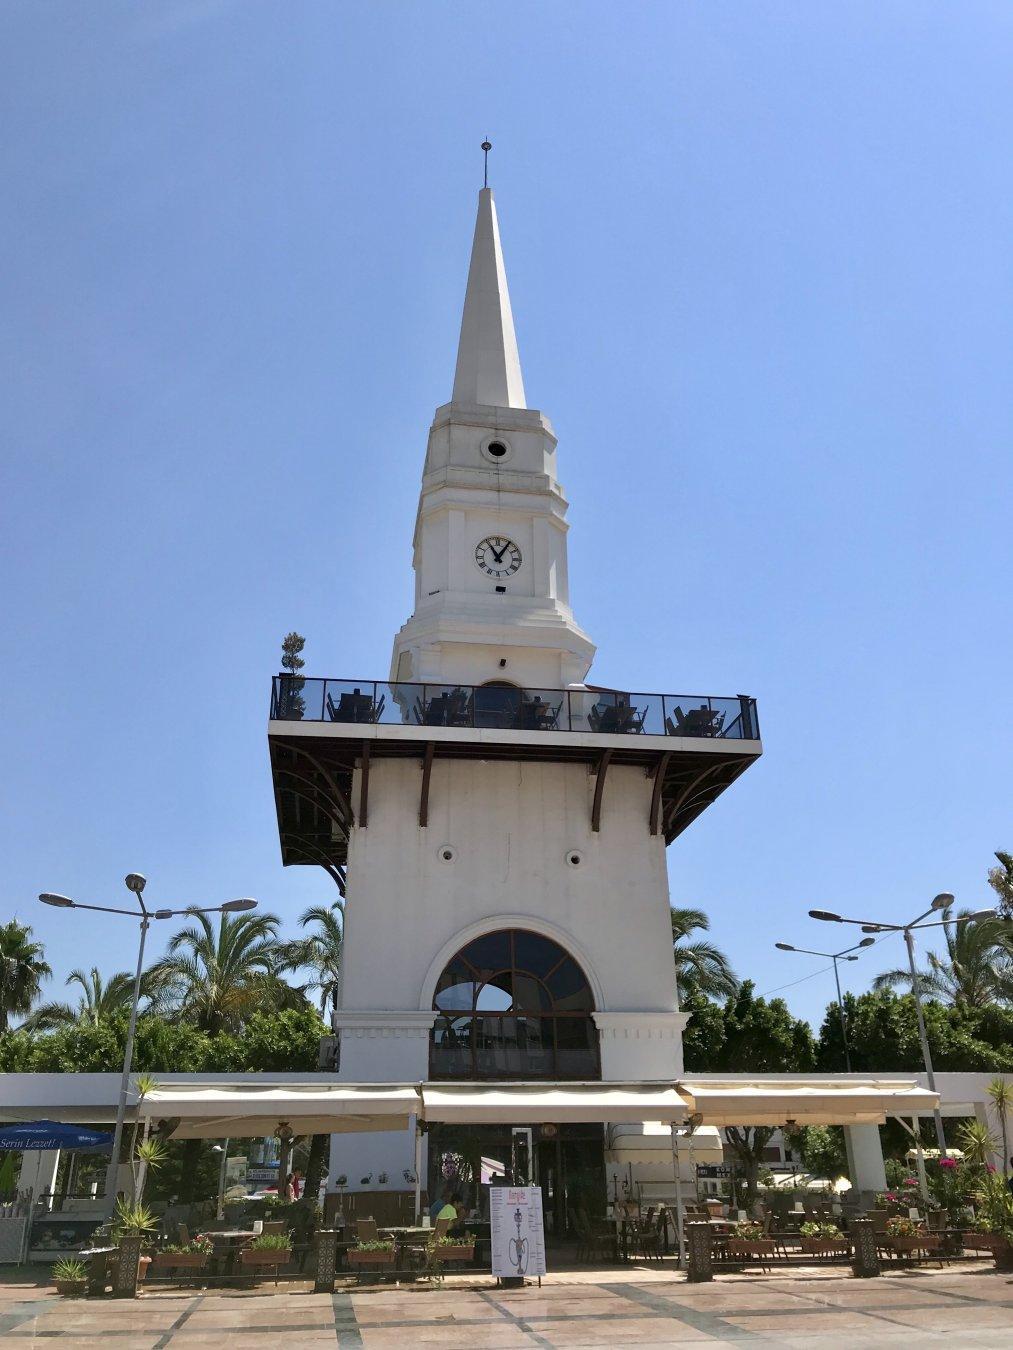 Kemer Tower